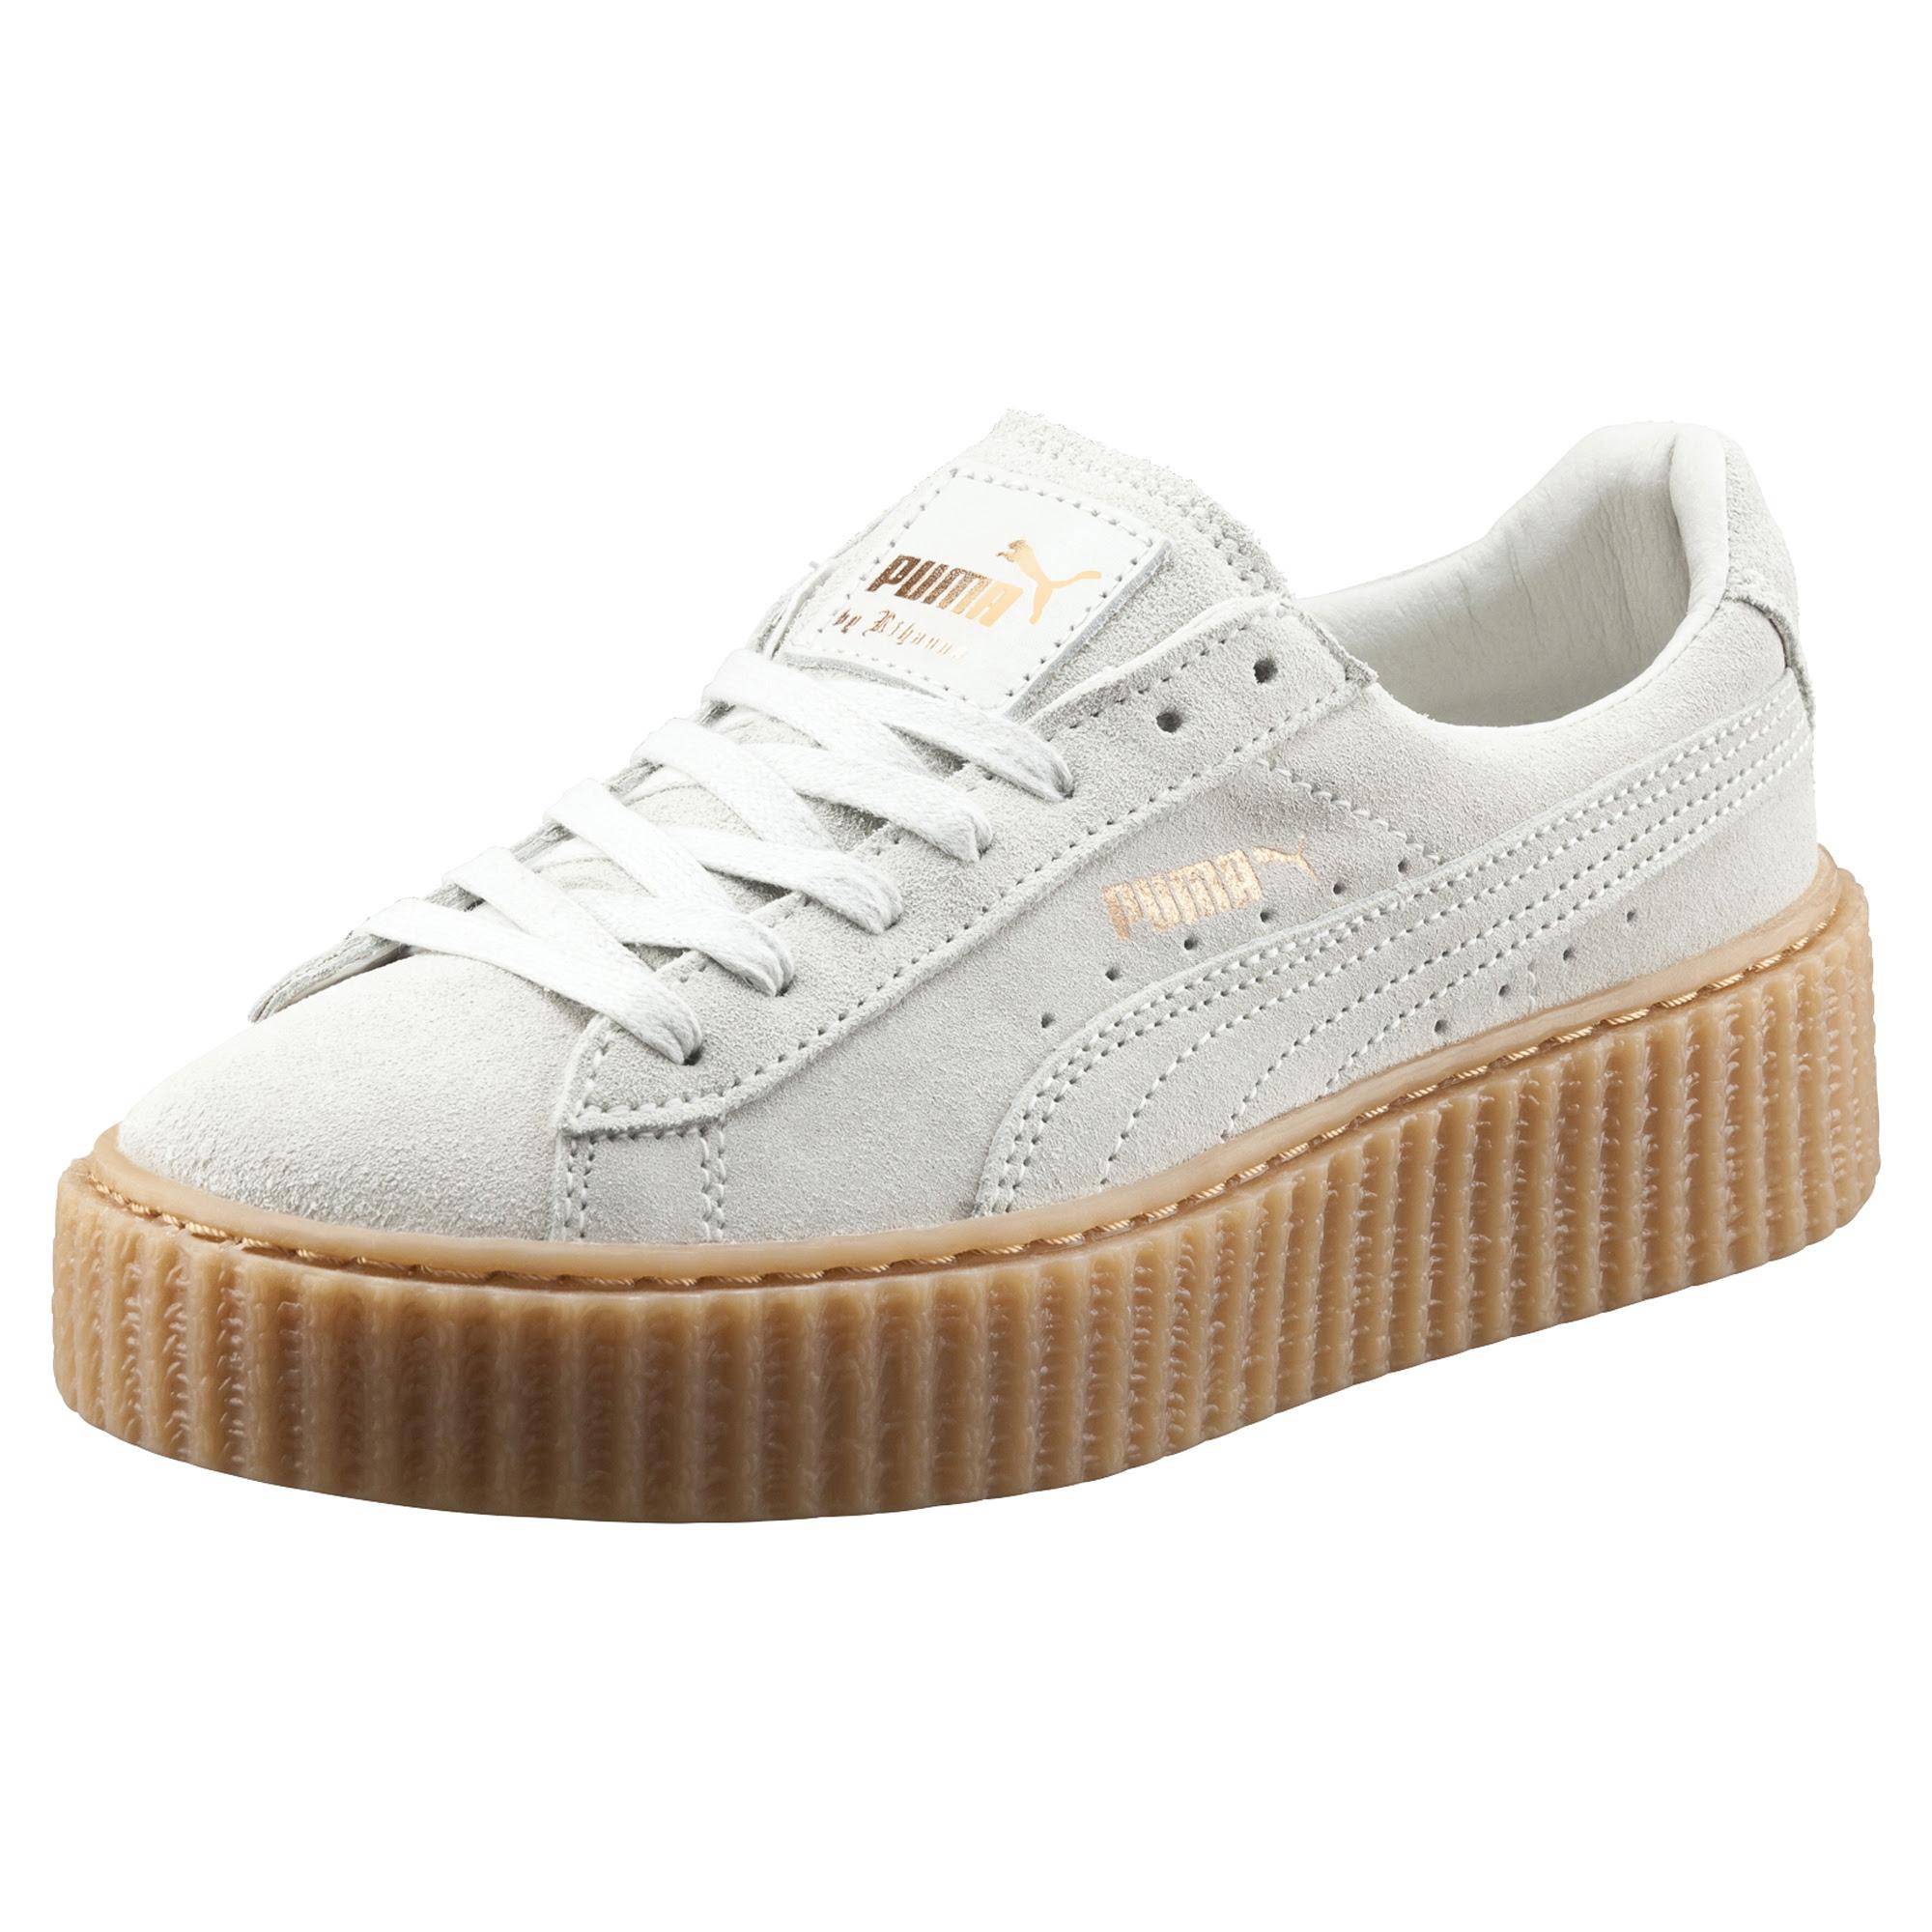 Rihanna x Puma Creeper Sneakers Drop Friday In New Colors